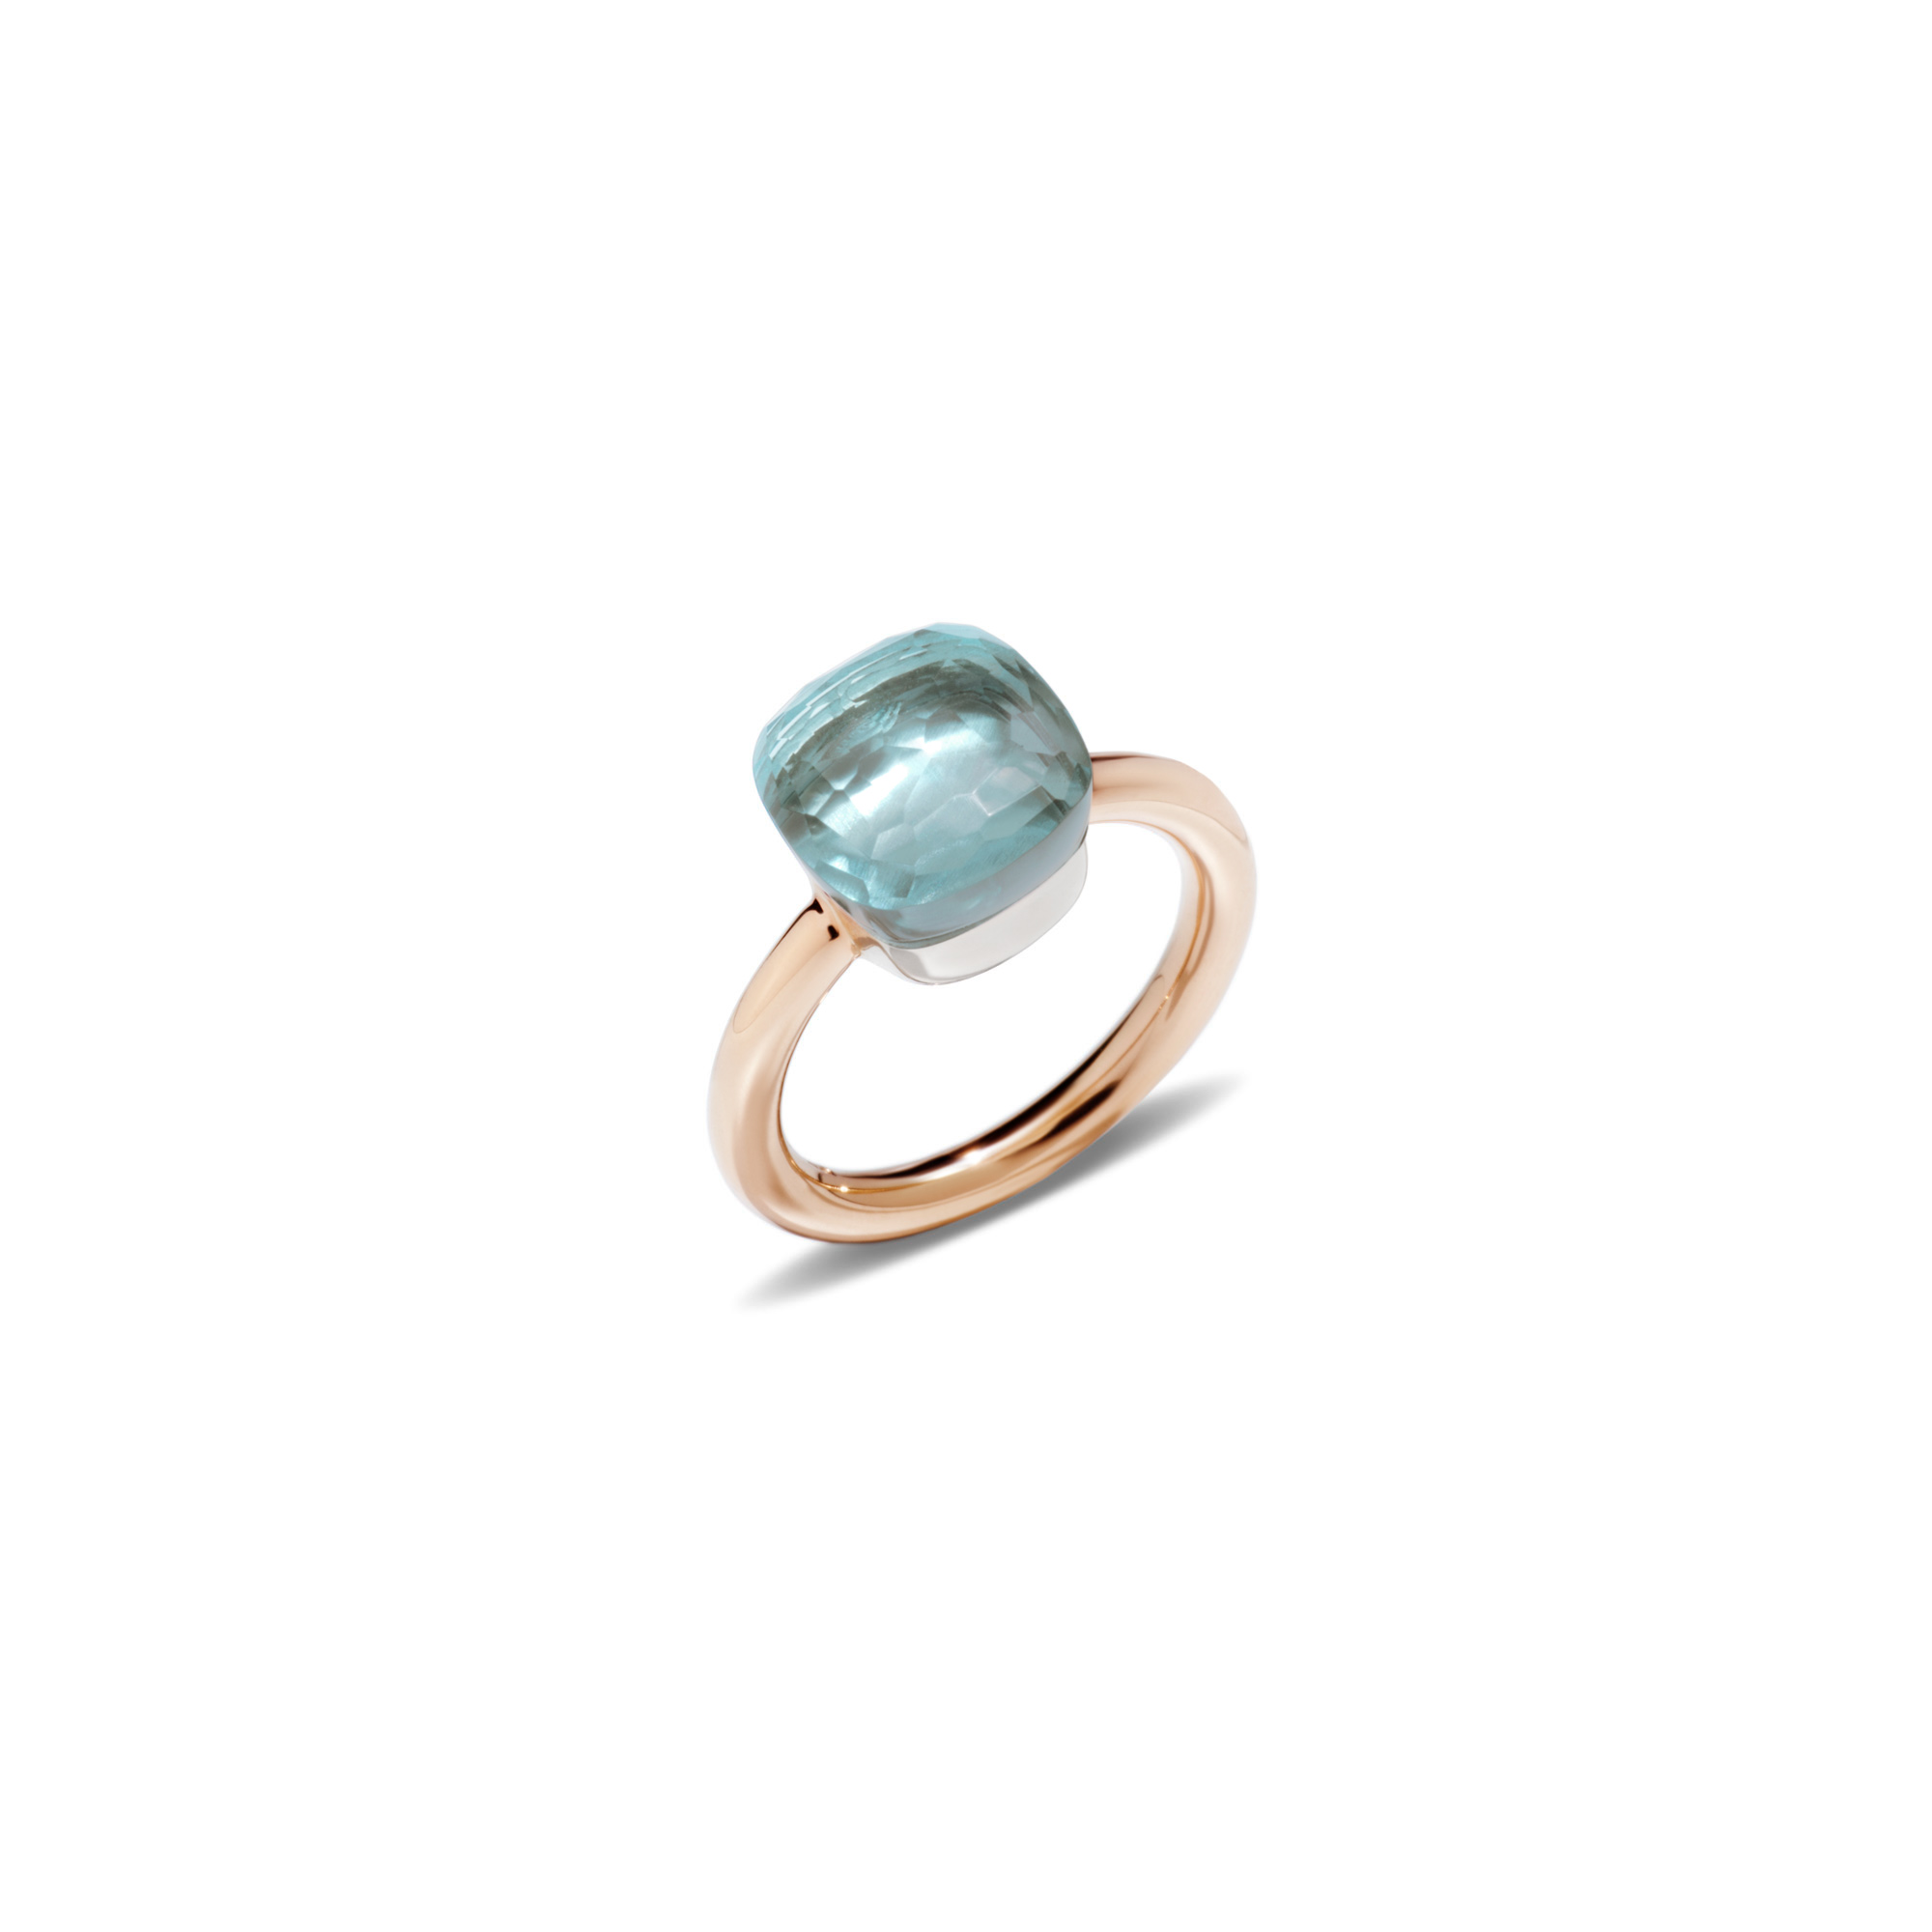 Pomellato Nudo Ring aus Rosegold mit blauem Topas